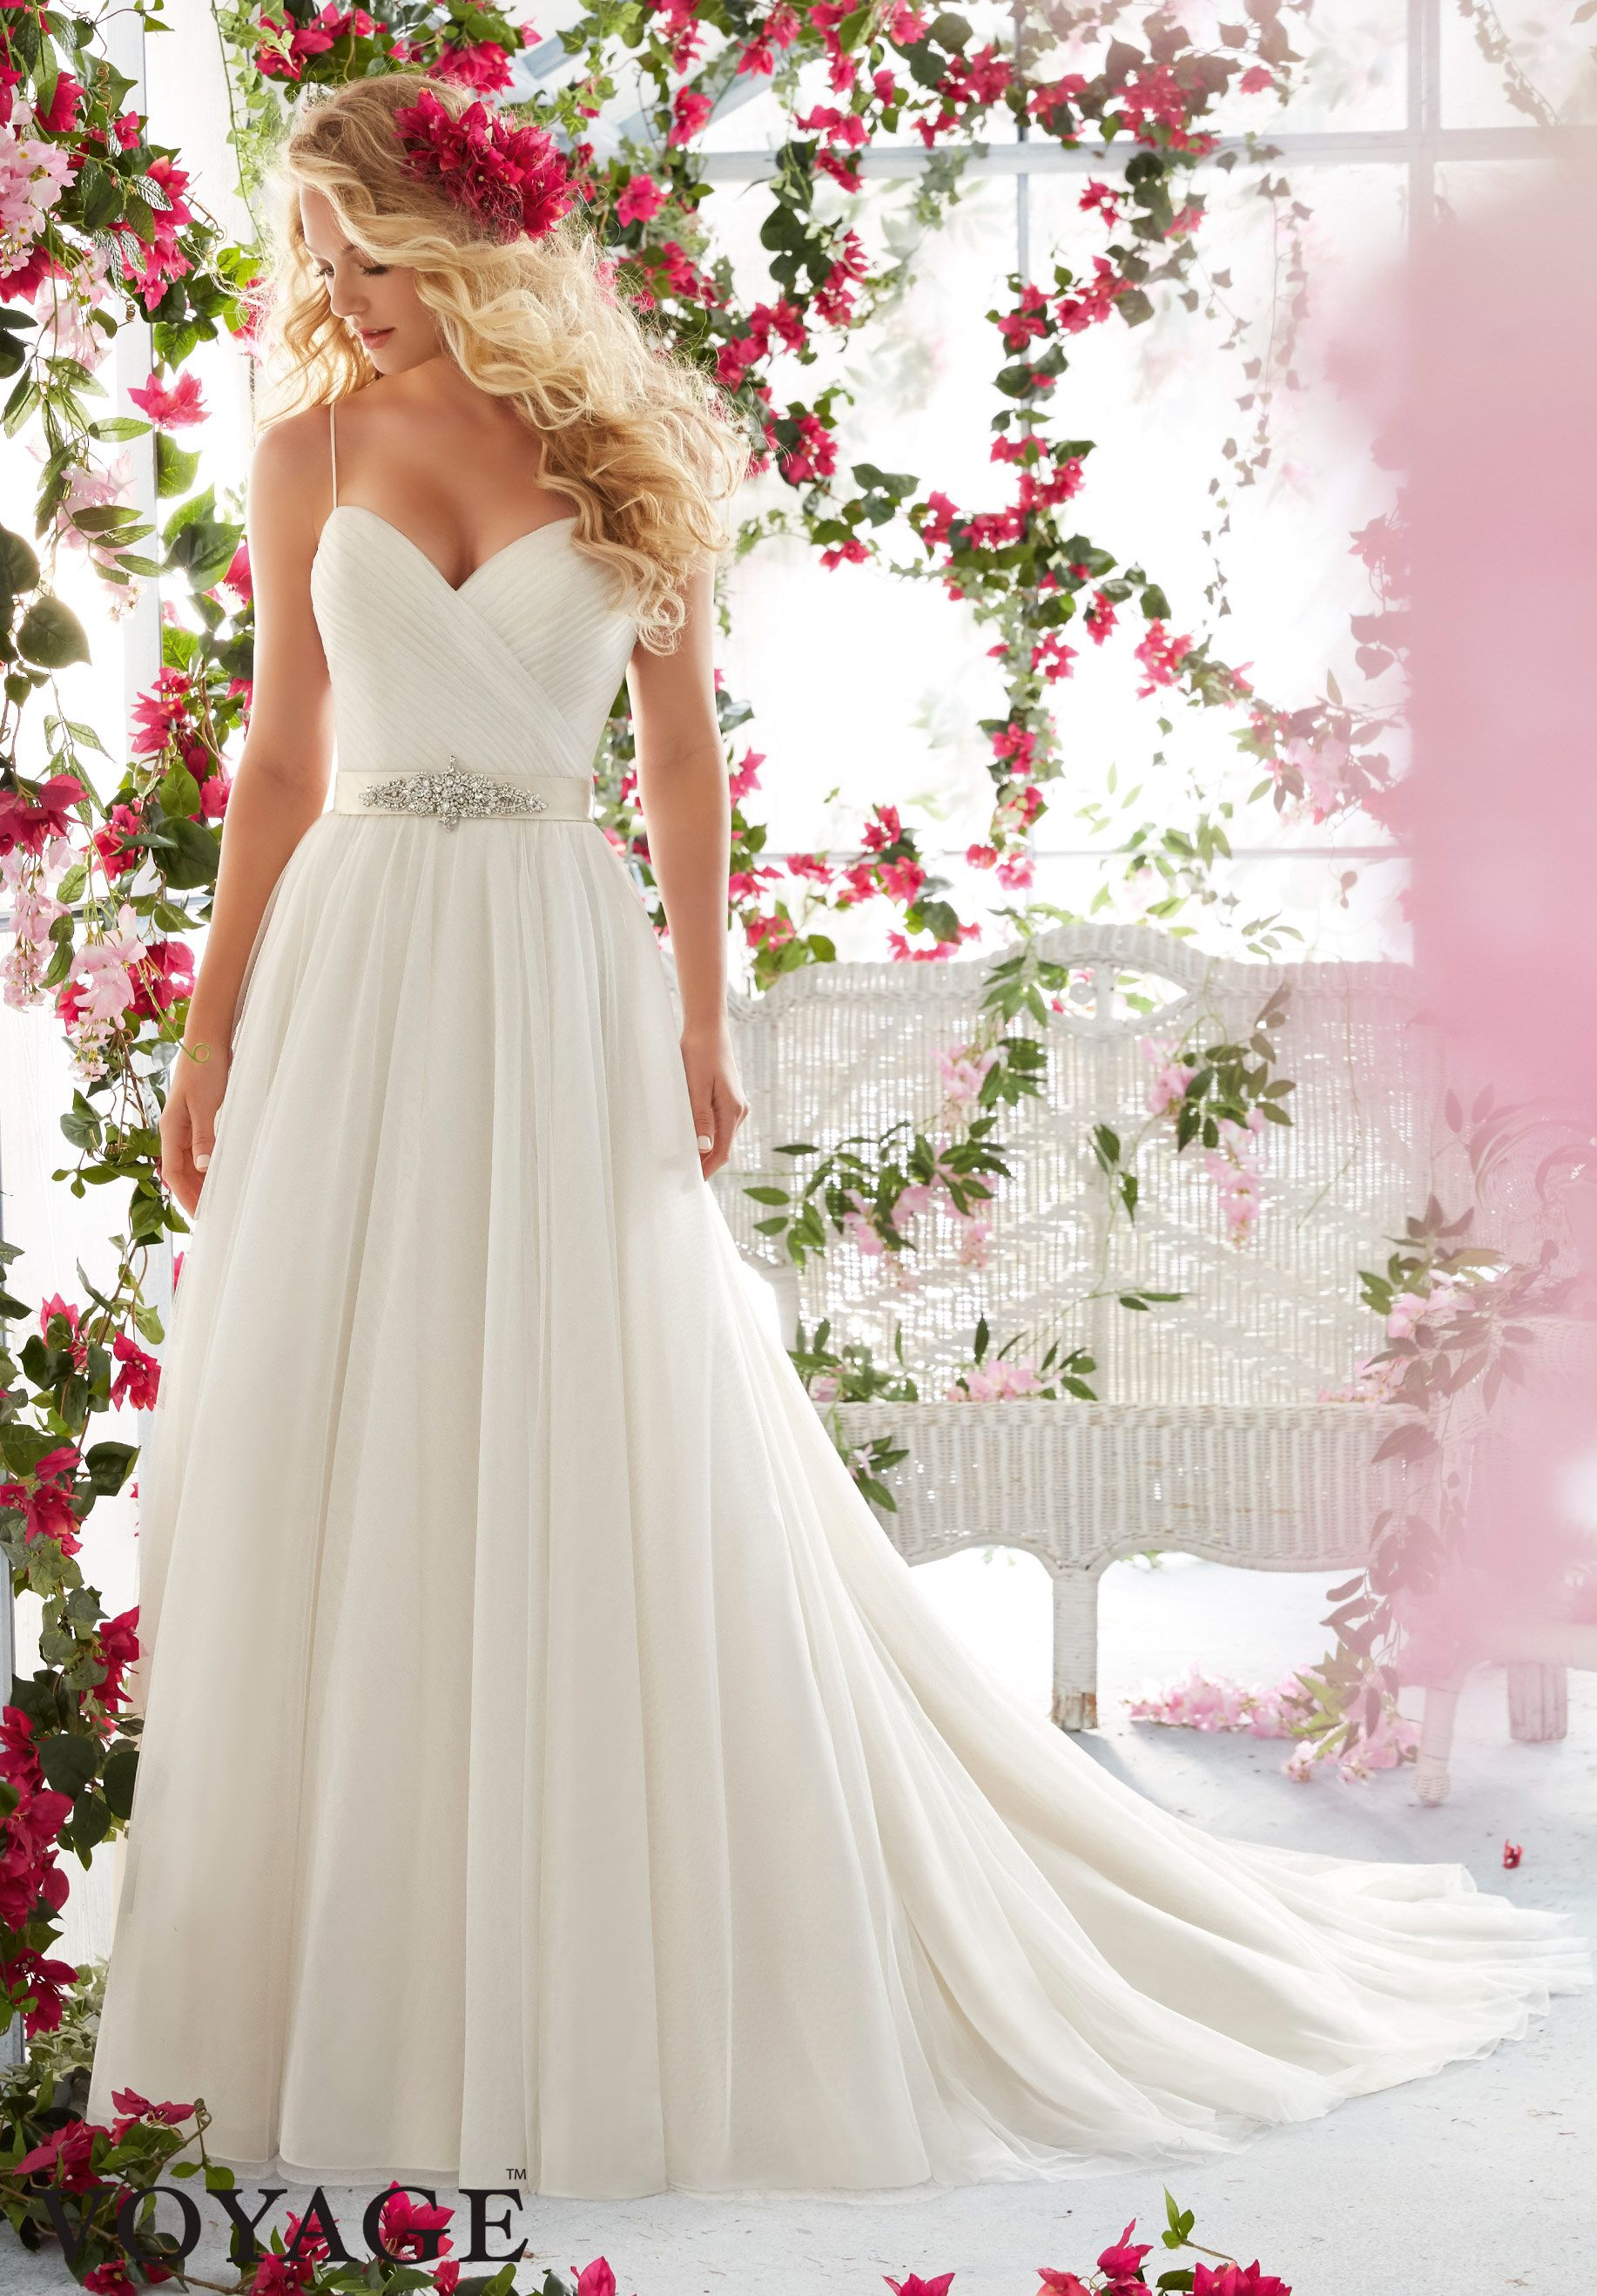 Simple elegant wedding dress designers   Wedding Dress By Voyage featuring Asymmetrically Draped Bodice